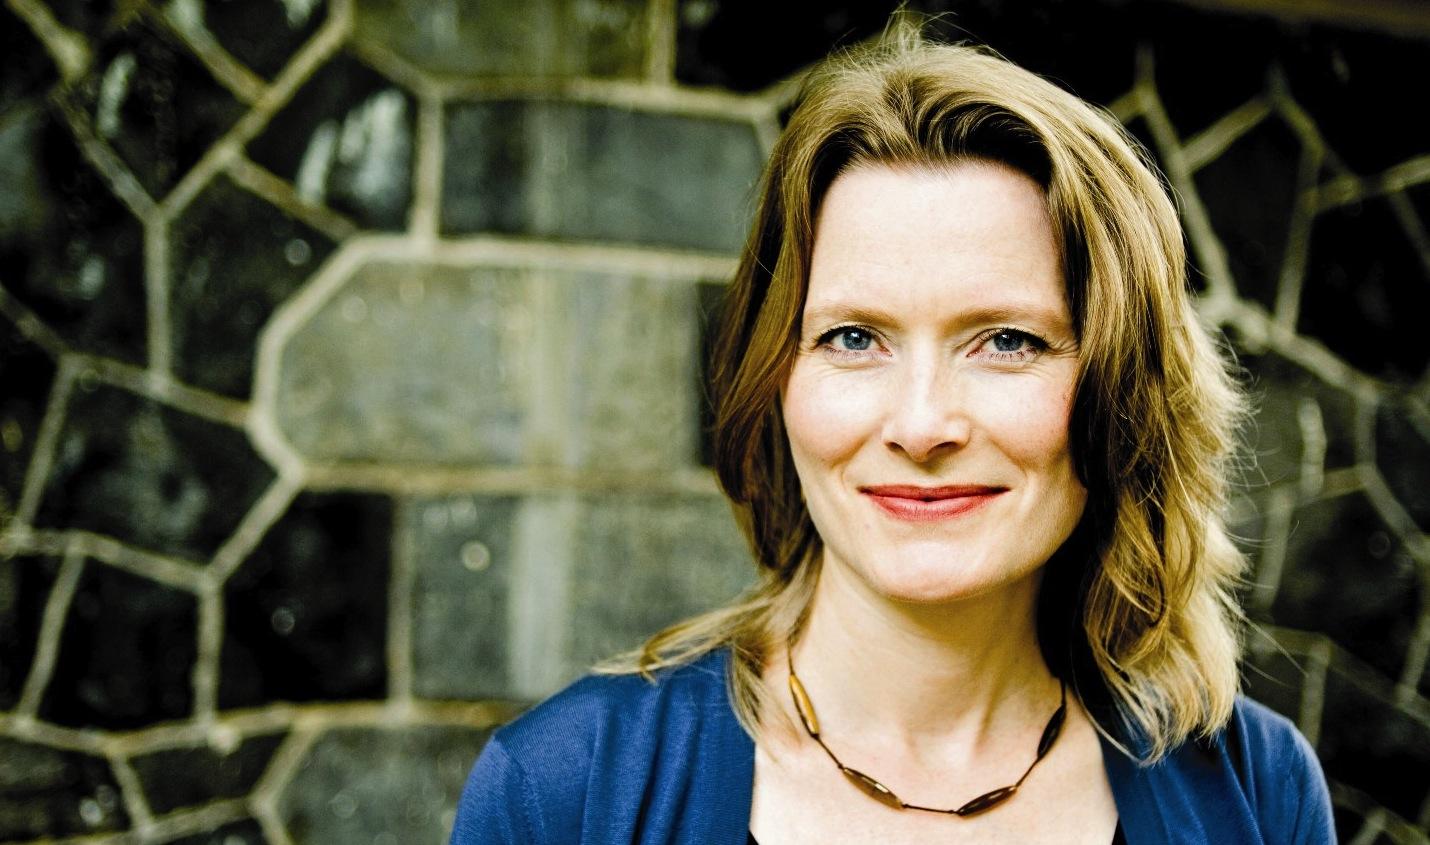 Jennifer-Egan-c-Pieter-M.-Van-Hattem-blue